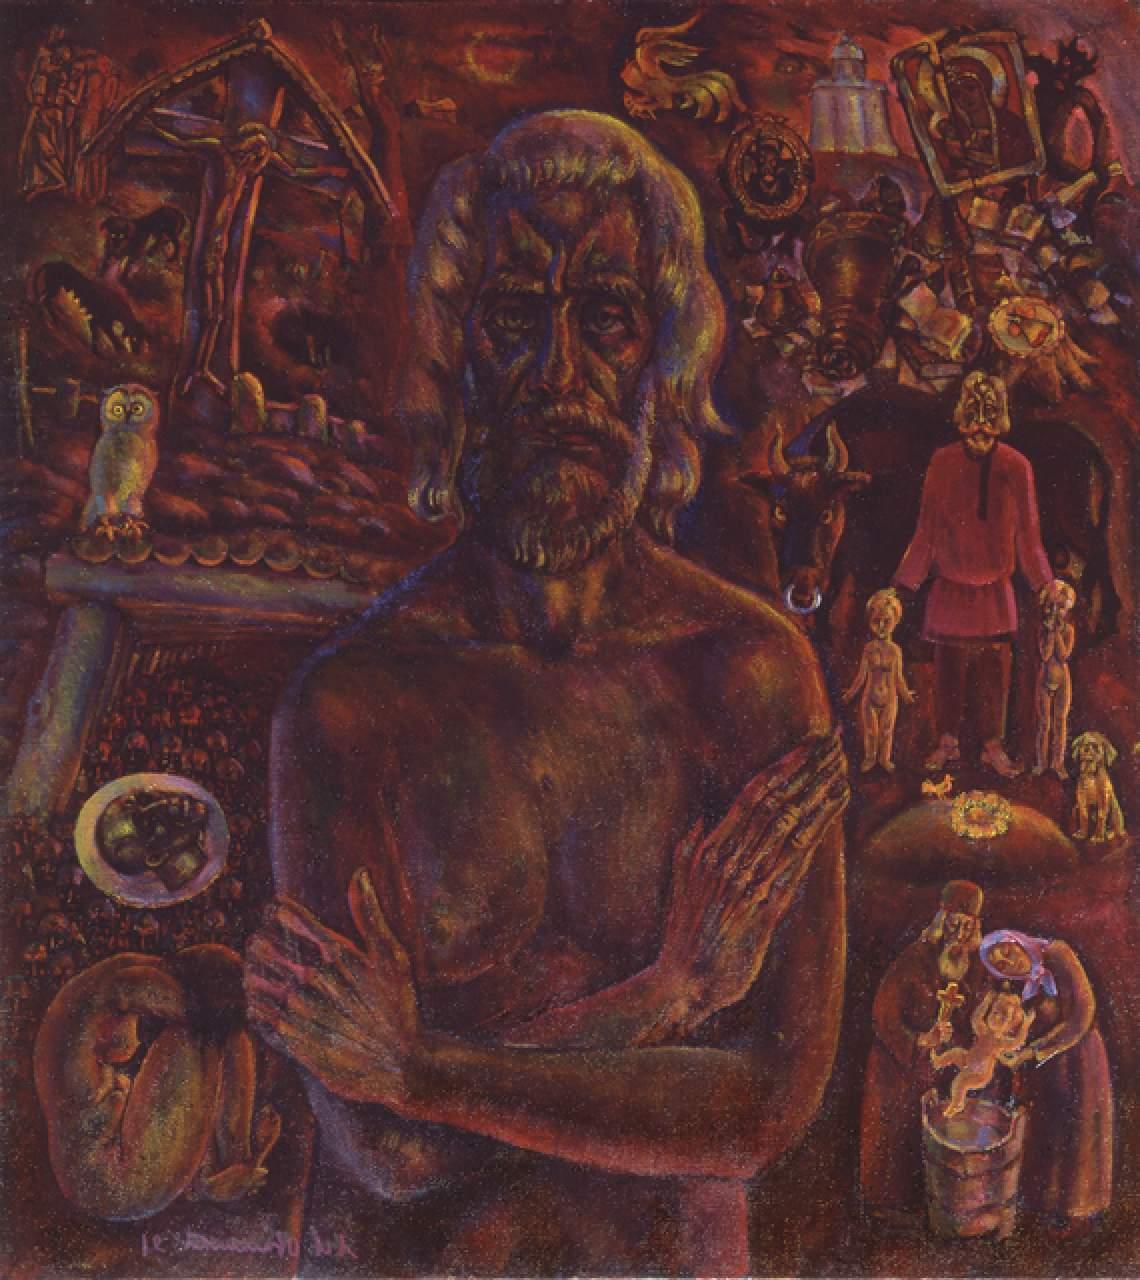 АВТОПОРТРЕТ. 1989—91 гг. Холст, масло, 97 х 87 см